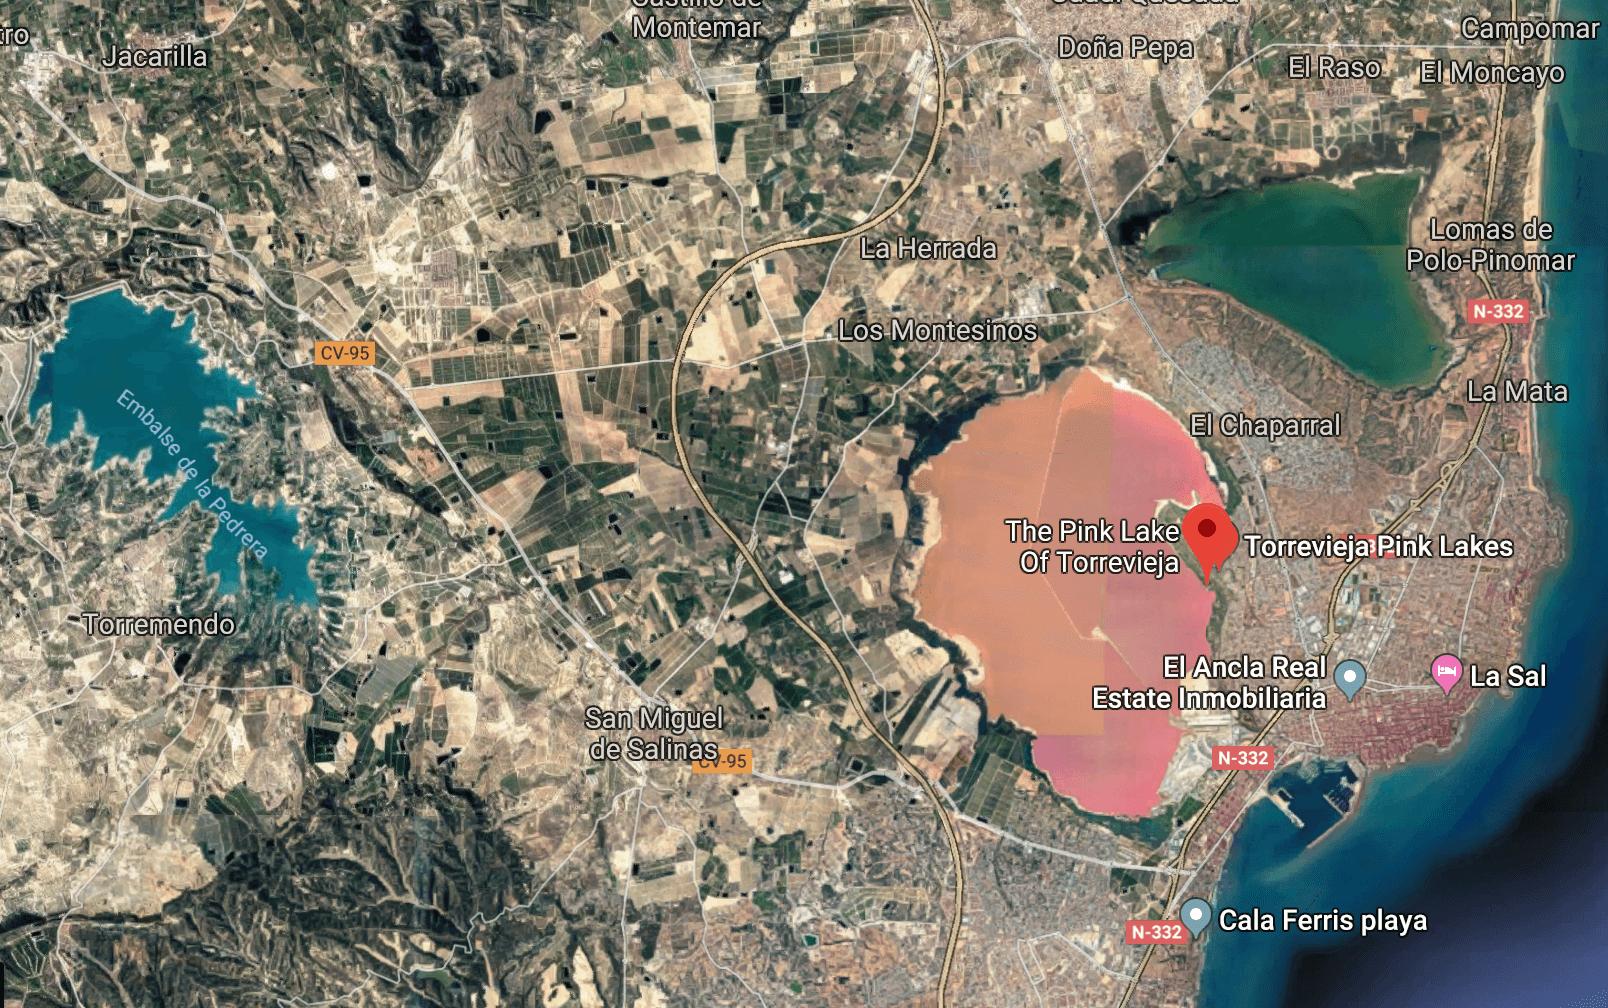 Las Salinas de Torrevieja - Spain's two stunning pink salt lakes